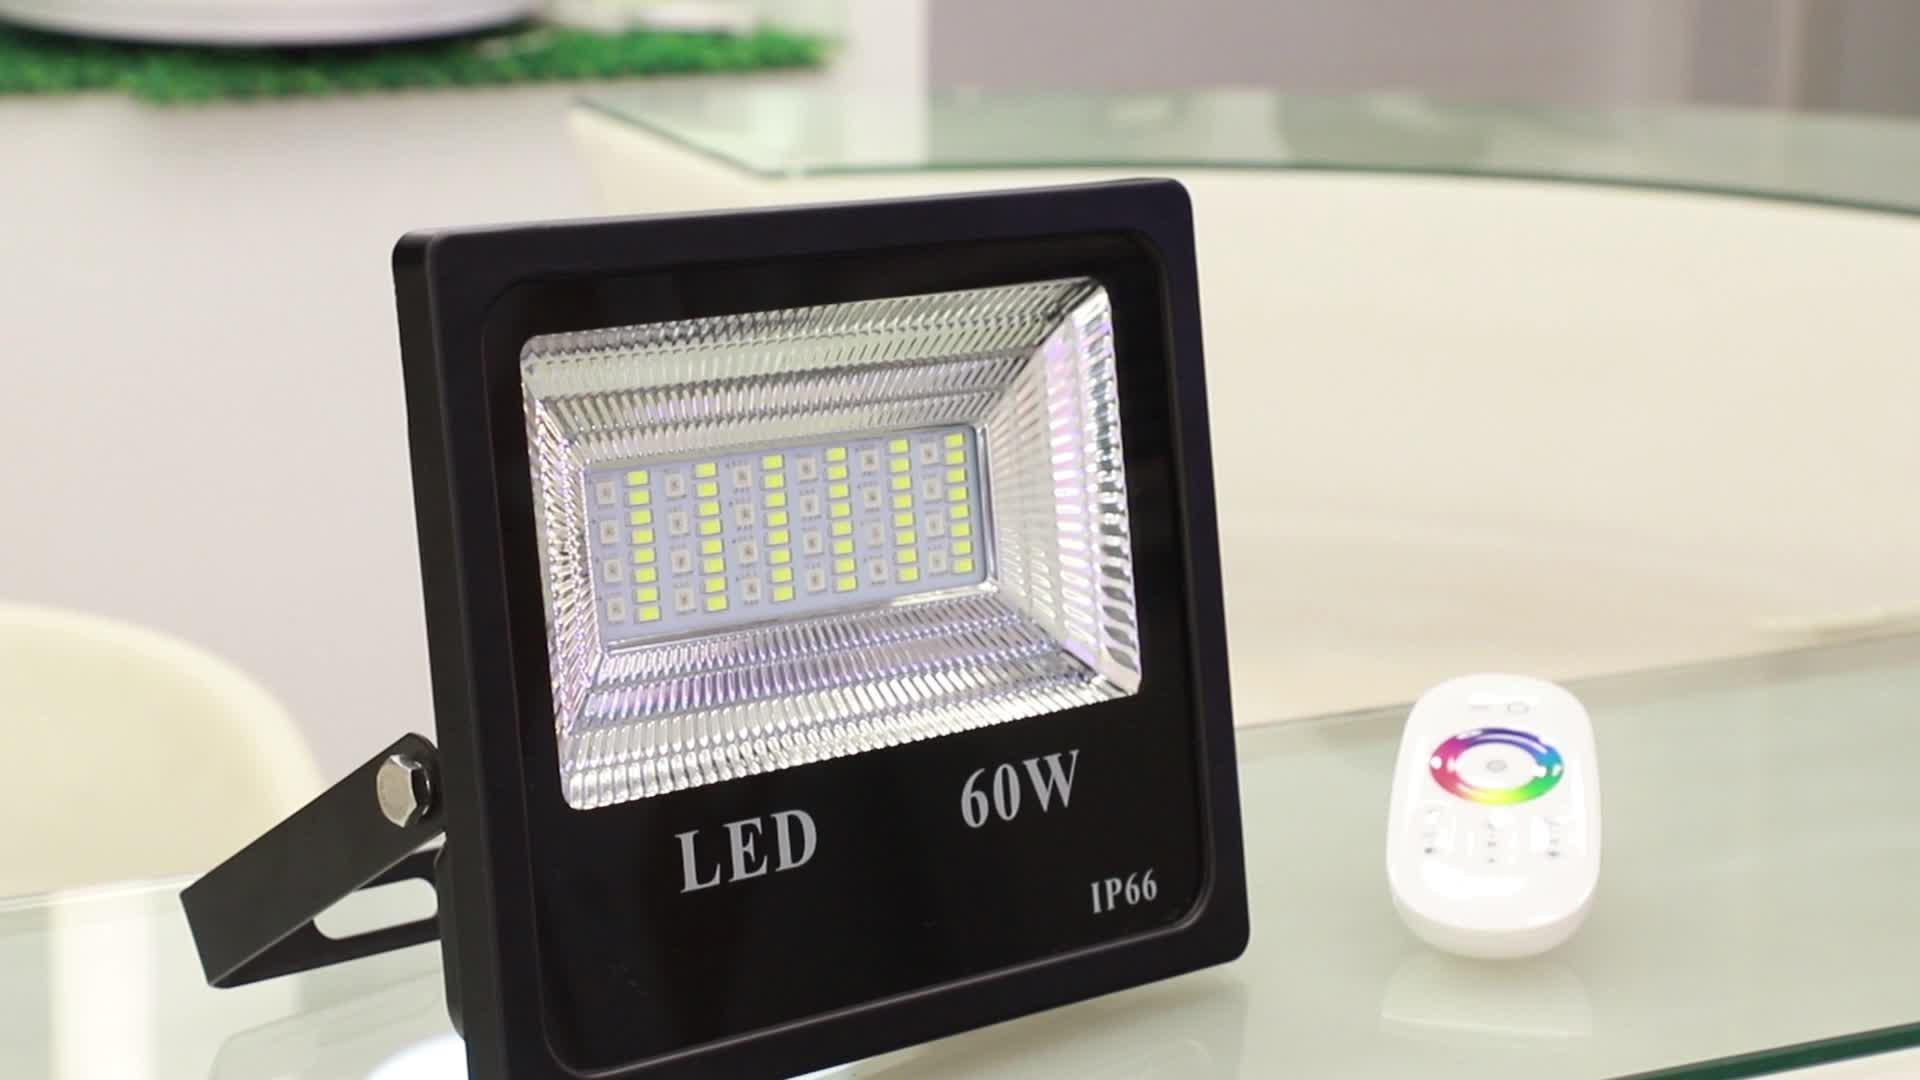 16Million Music RGBW 60W Bluetooth App Control LED Flood Lights Outdoor Led Landscape Lightings RGBW Bluetooth Smart Floodlights